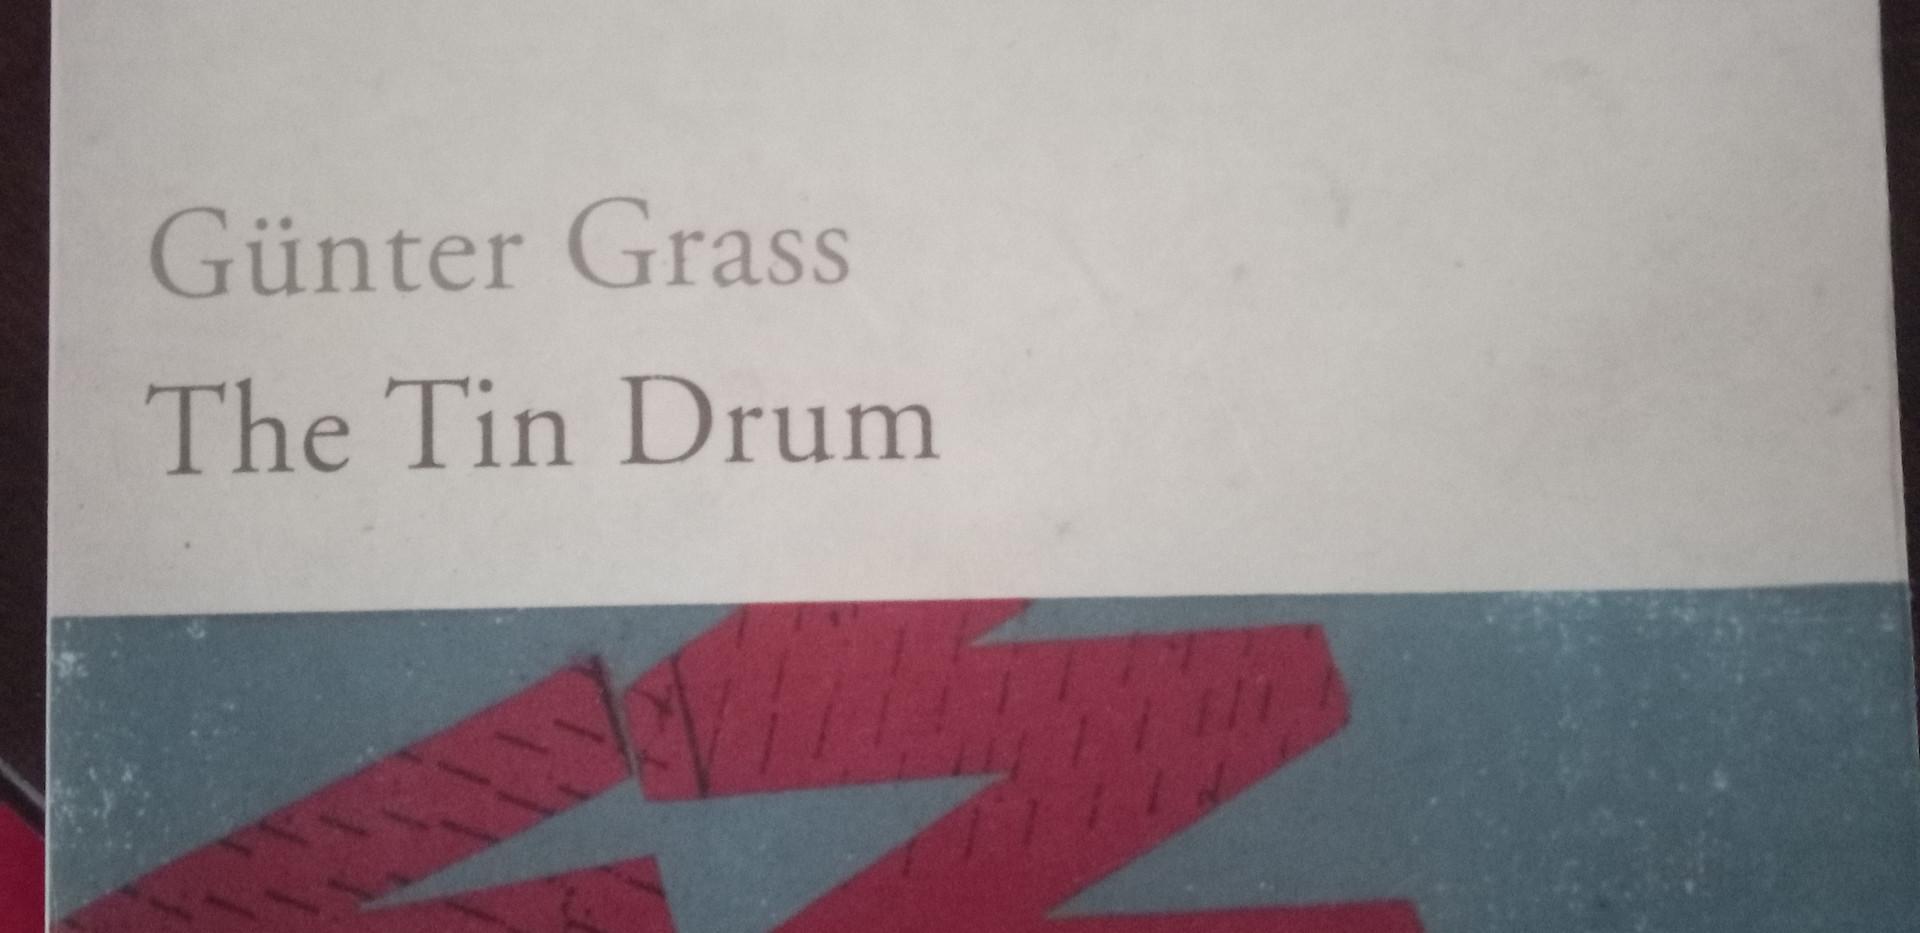 Gunter grass - The Tin Drum